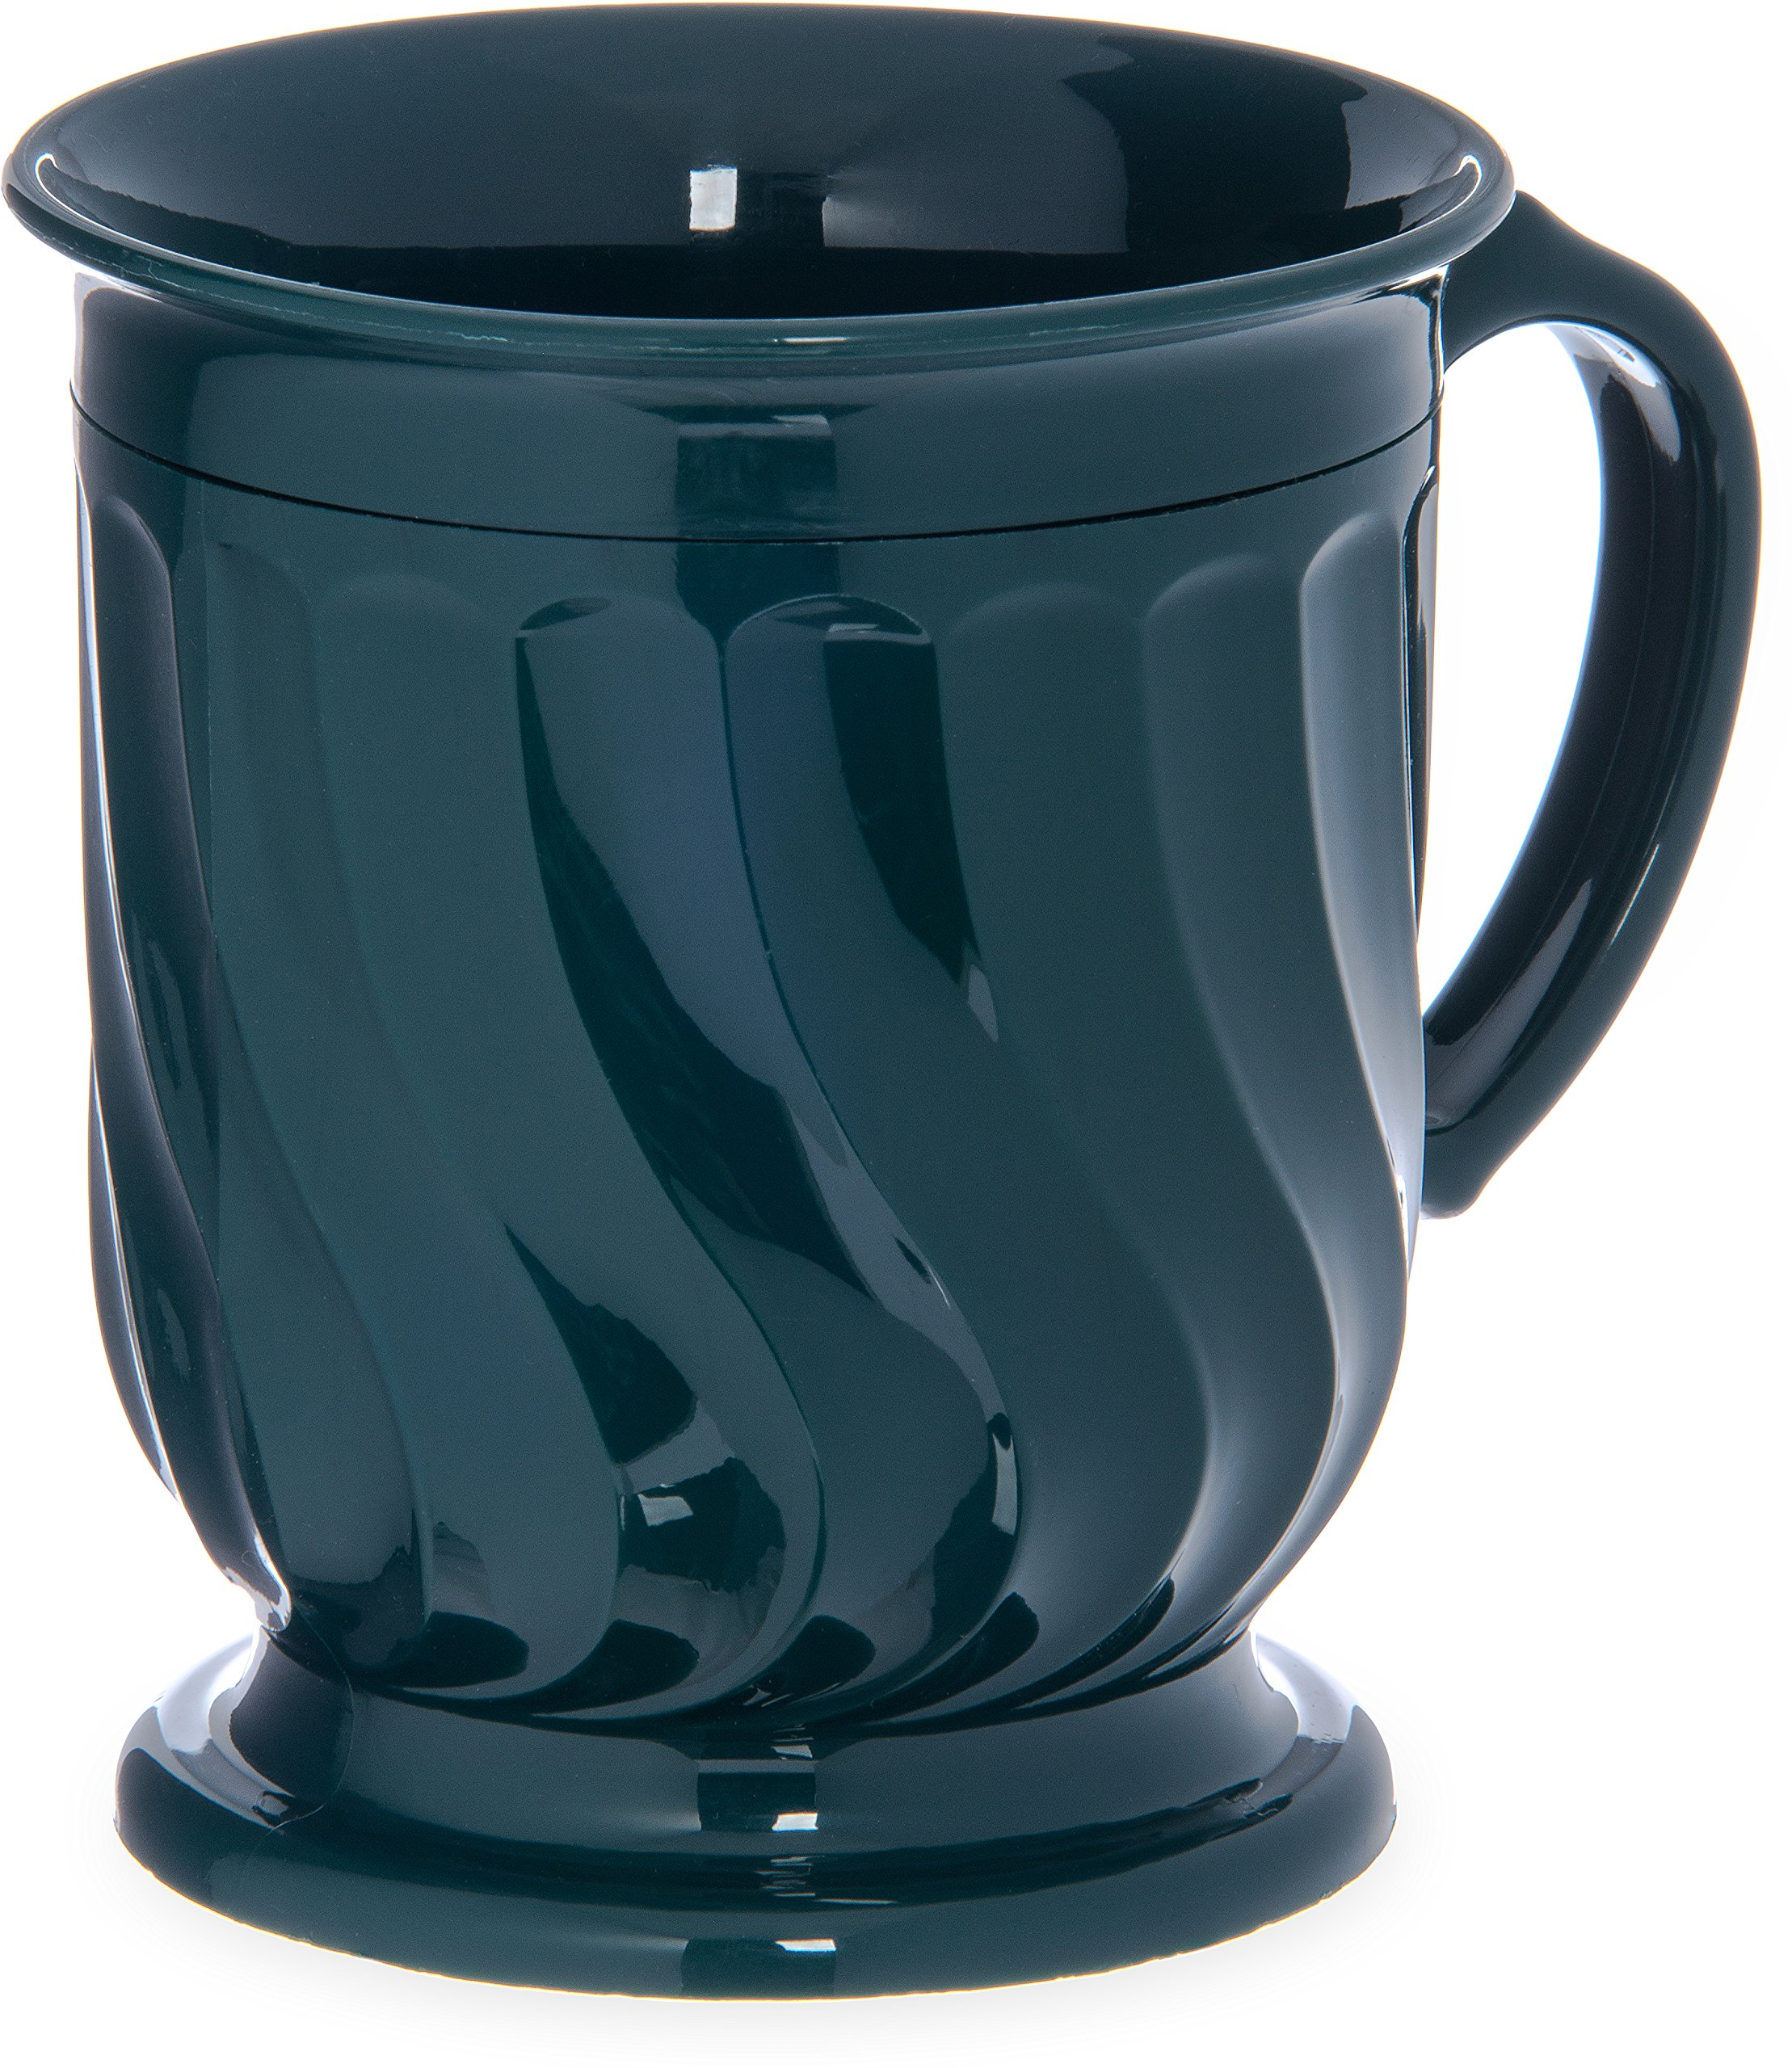 Dinex DX300008 Turnbury Insulated Pedestal Base Mug, 8 oz., 4'' Height, 3.5'' Width, 3.5'' Length, Urethane Foam, Hunter Green (Pack of 48)